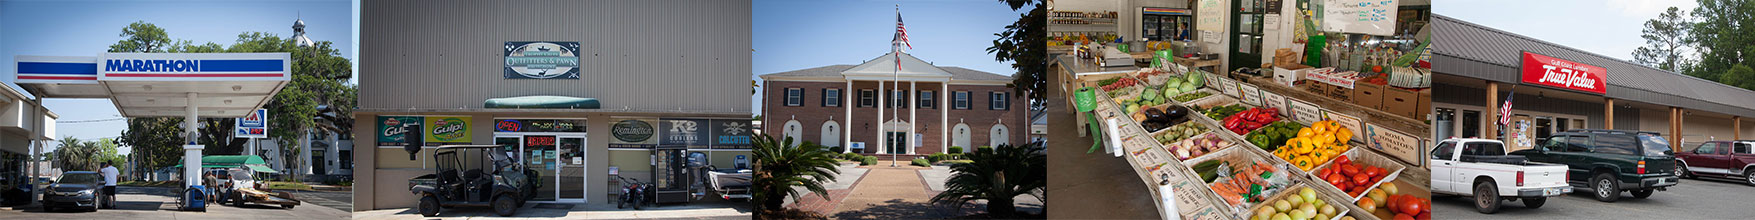 Small town retail businesses - Jefferson County Florida, Jefferson County, FL